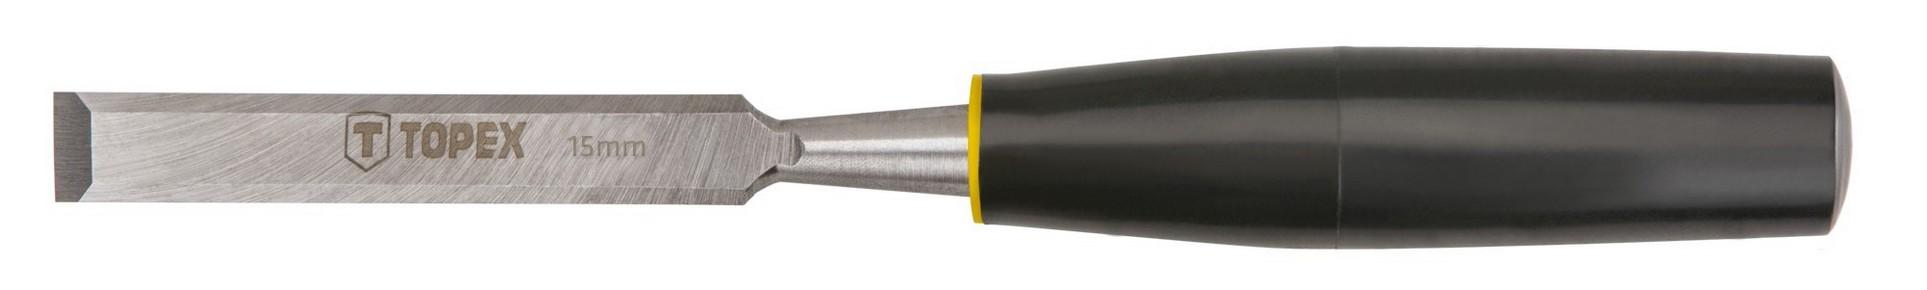 Favésõ 15 mm lapos, mûanyag nyelû | TOPEX 09A115